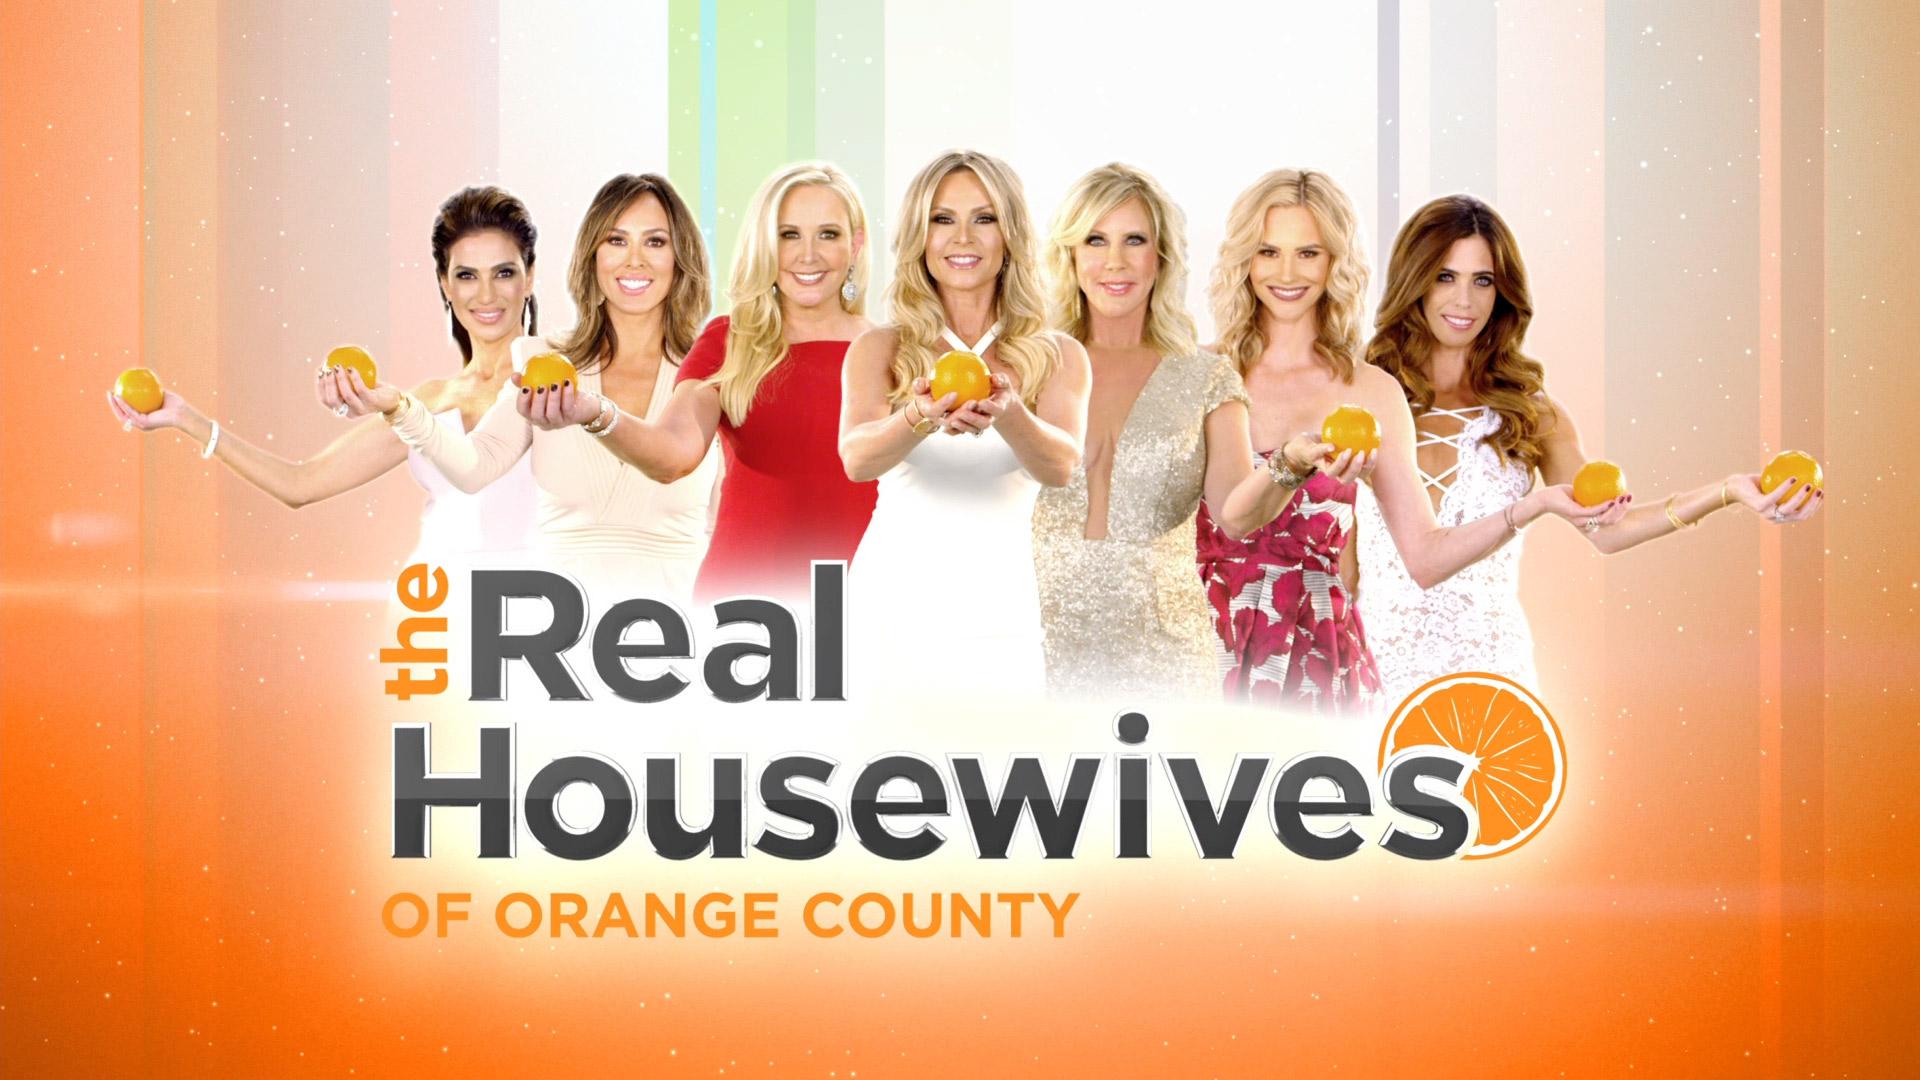 real housewives of orange county season 12 imdb